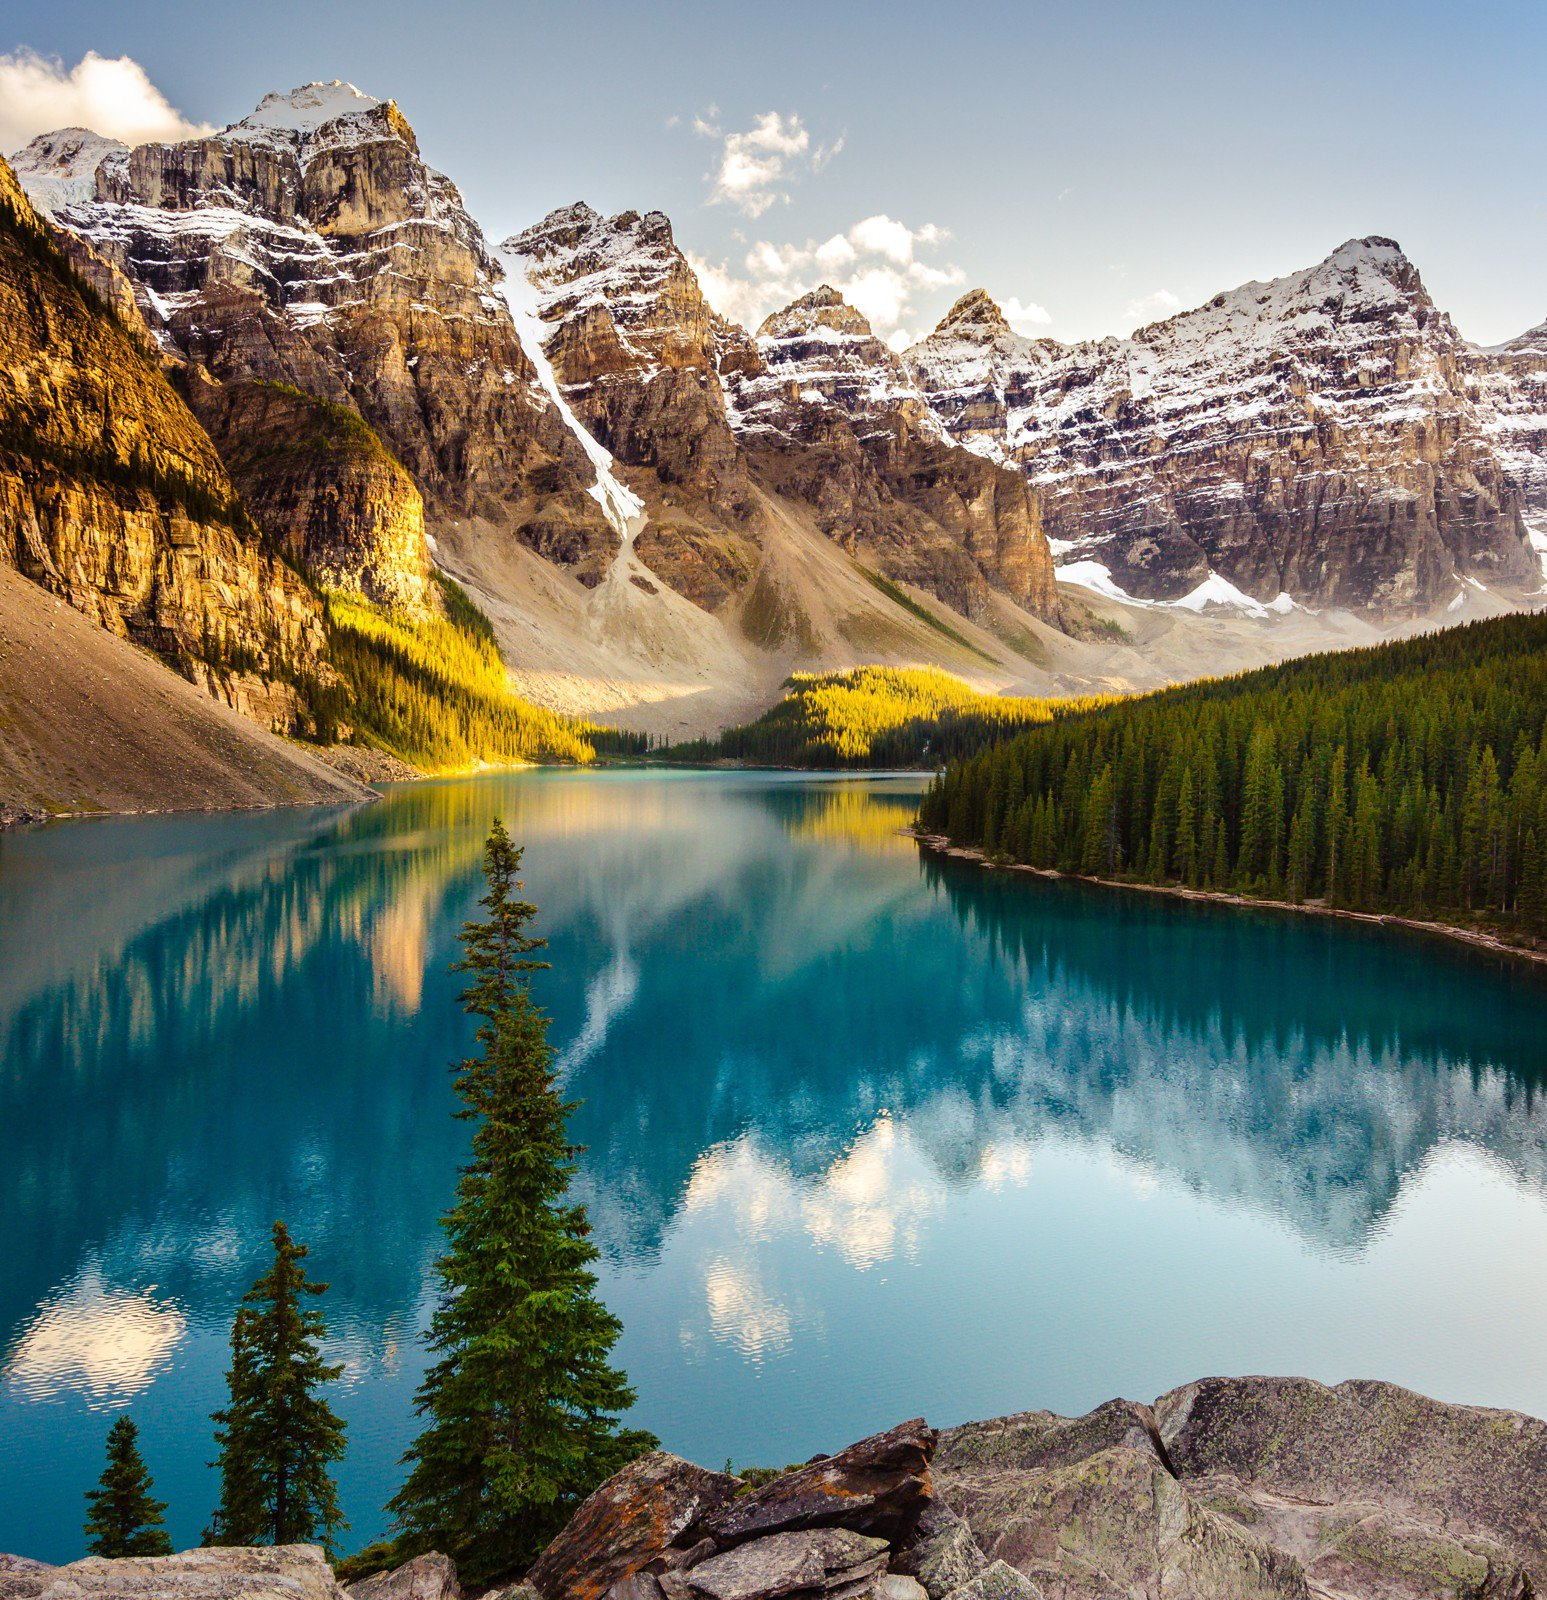 Infoavond West-Canada Zomer aanbod 2021 - online infosessie